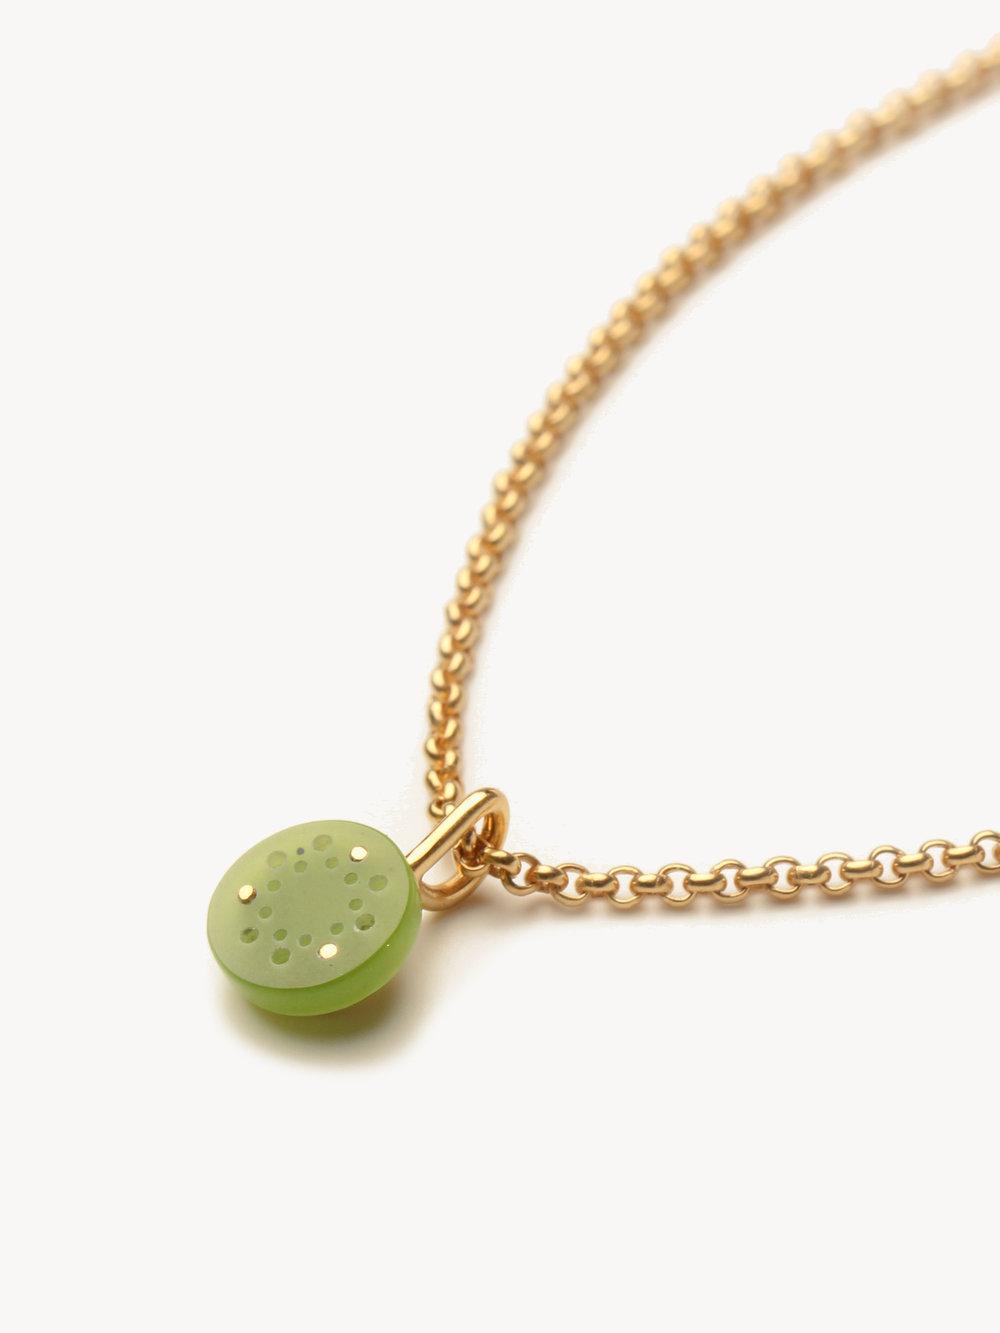 Lochwerk-Anhänger Petit in vergoldetem Silber und synthetischer Jade  Lochwerk-pendant Petit in goldplated silver and synthetic jade